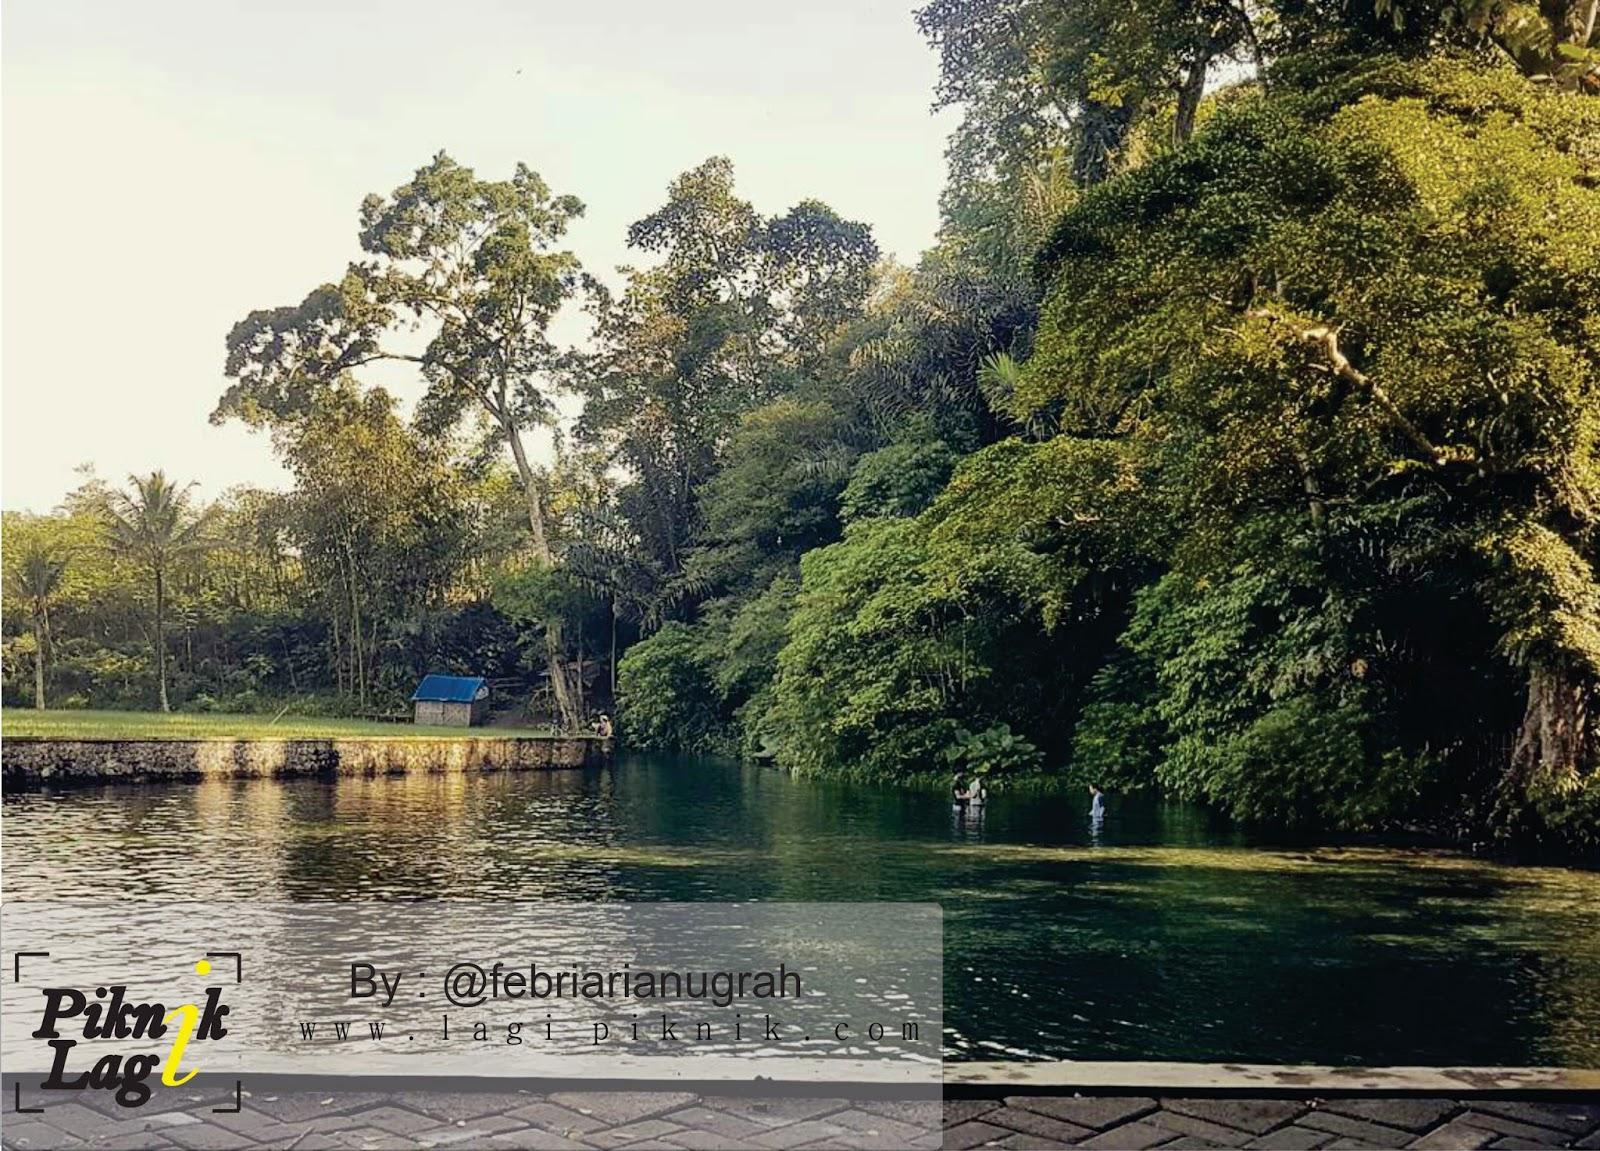 Tempat Menarik Malang Piknik Mata Air Sumber Sirah Kota